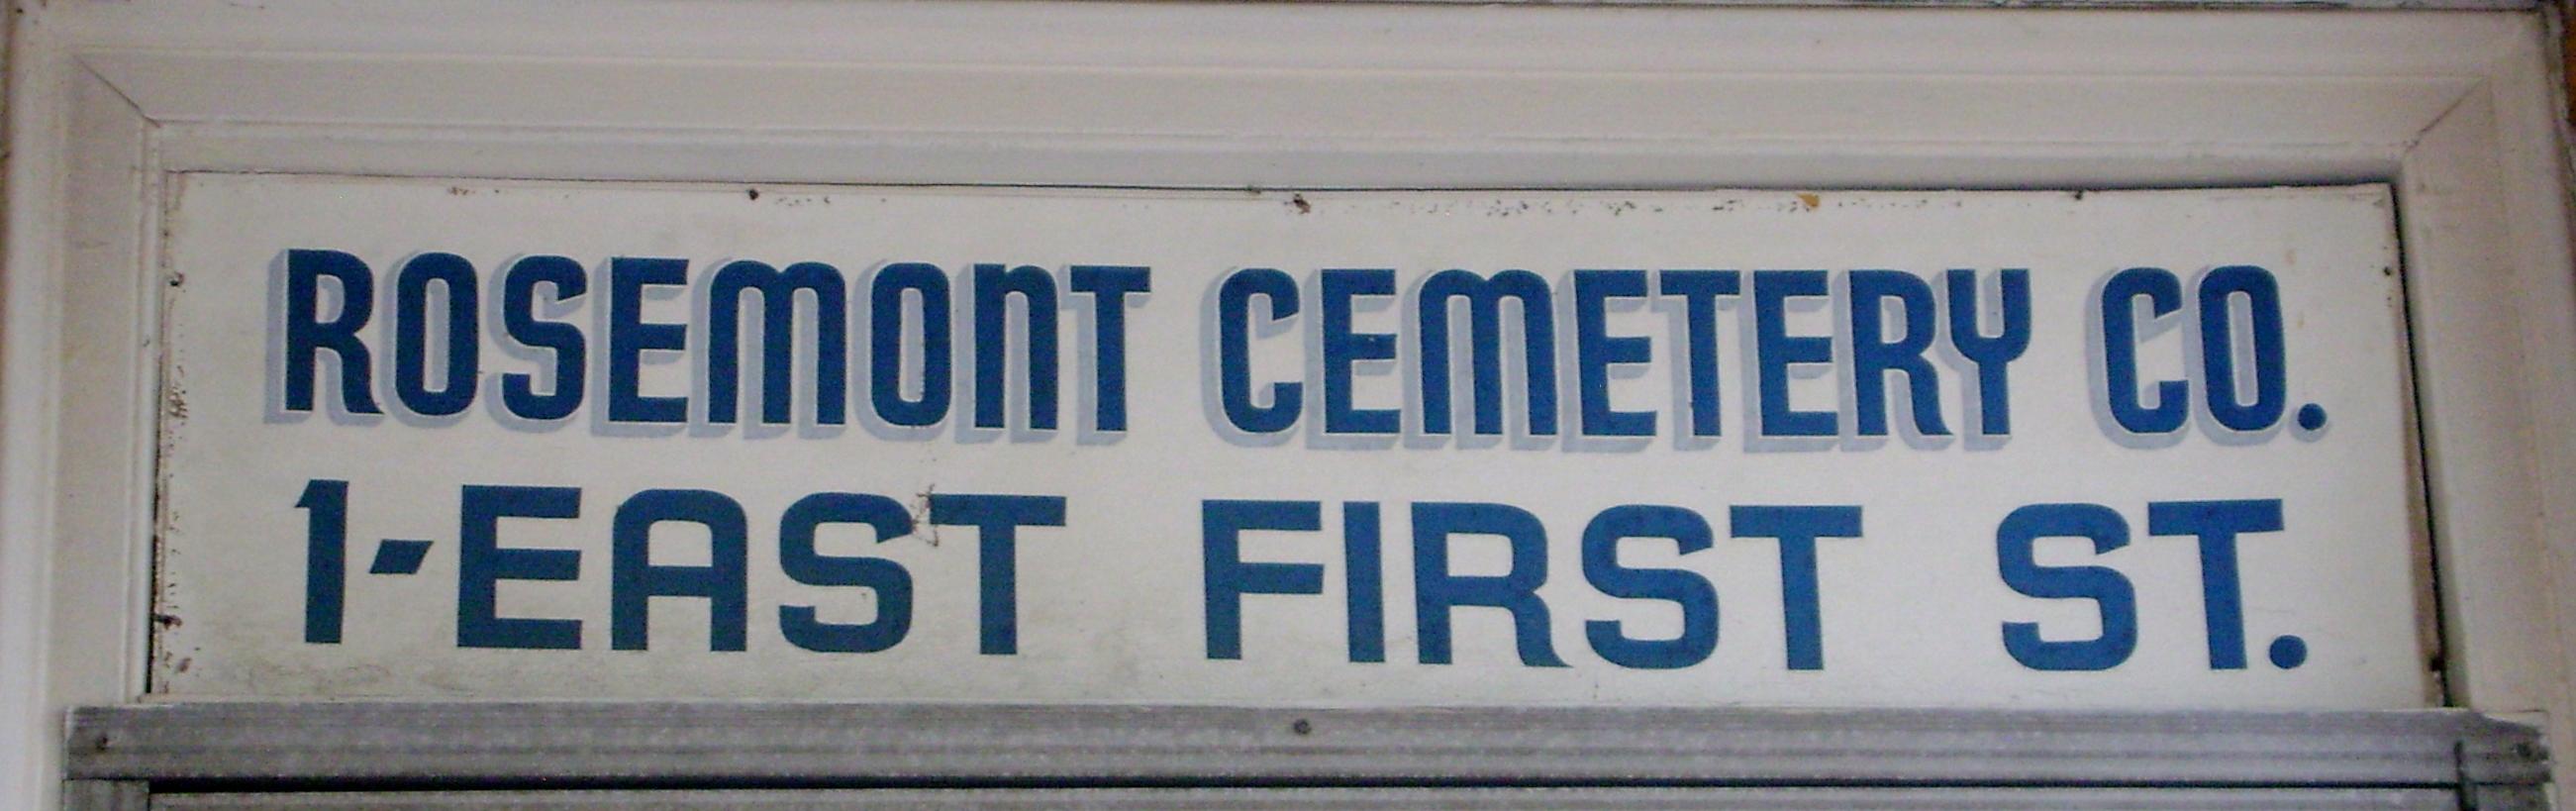 Old Rosemont Cemetery